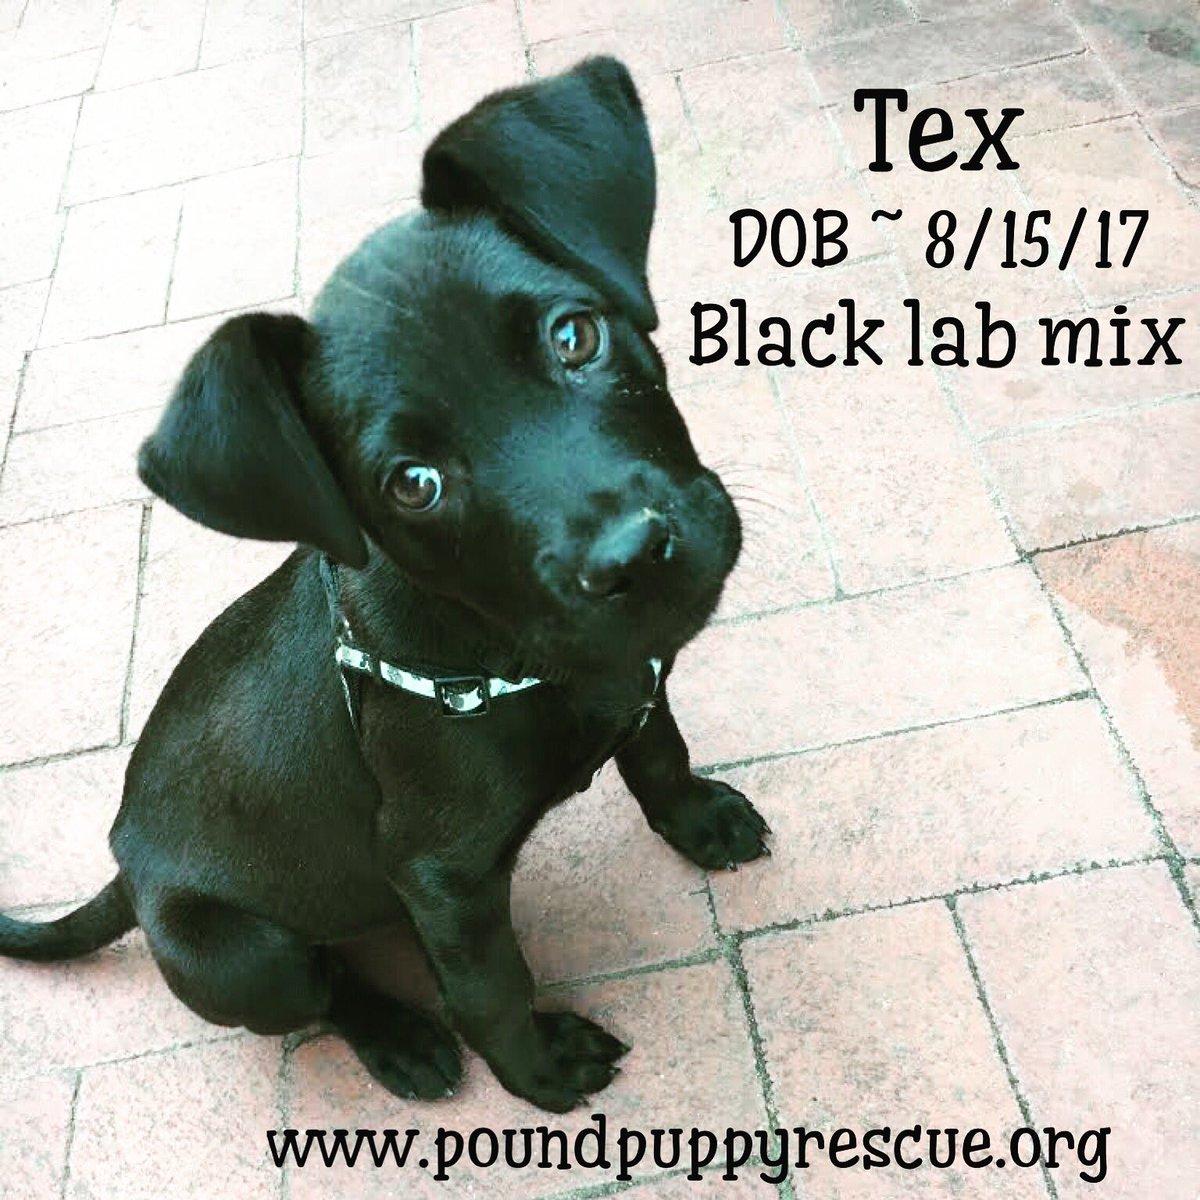 Pound Puppy Rescue PPRpoundpuppies